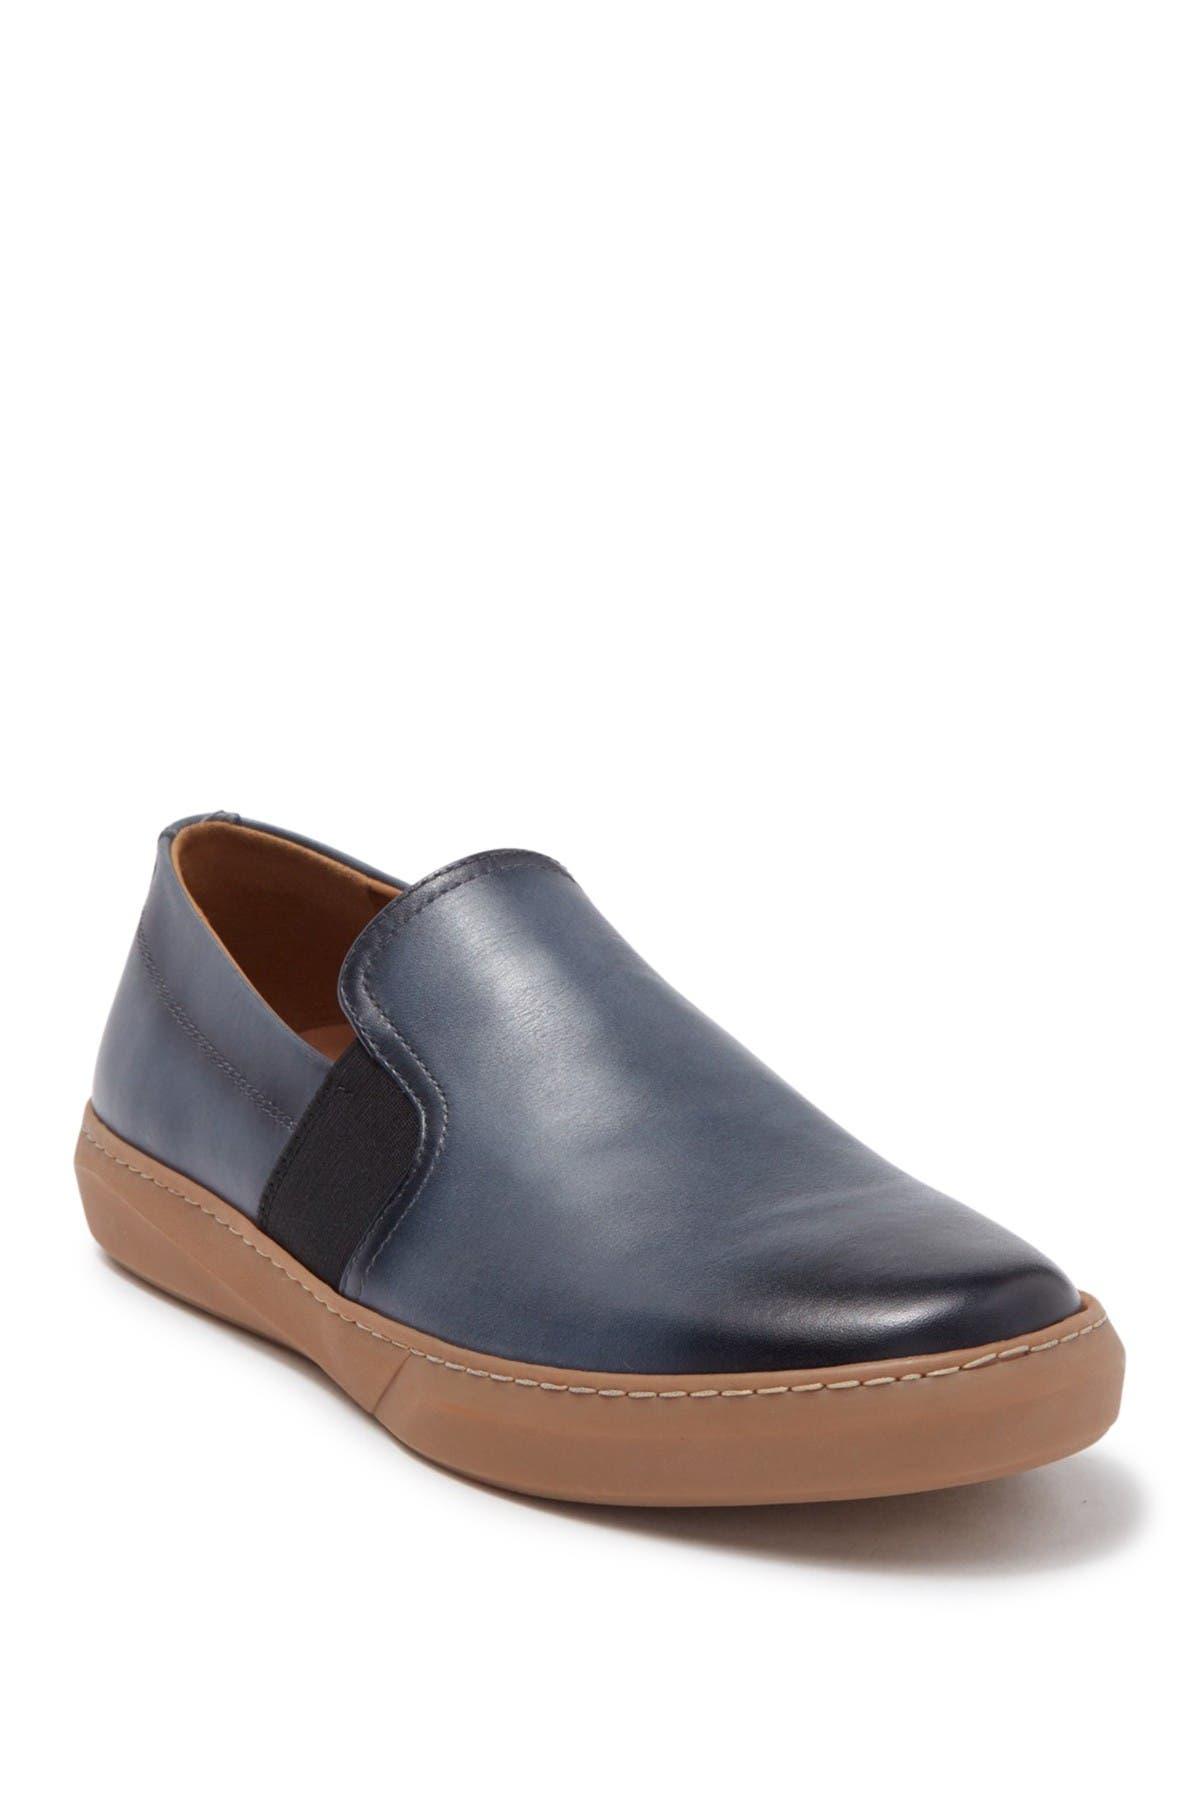 MORAL CODE Dustin Leather Slip-On Sneaker